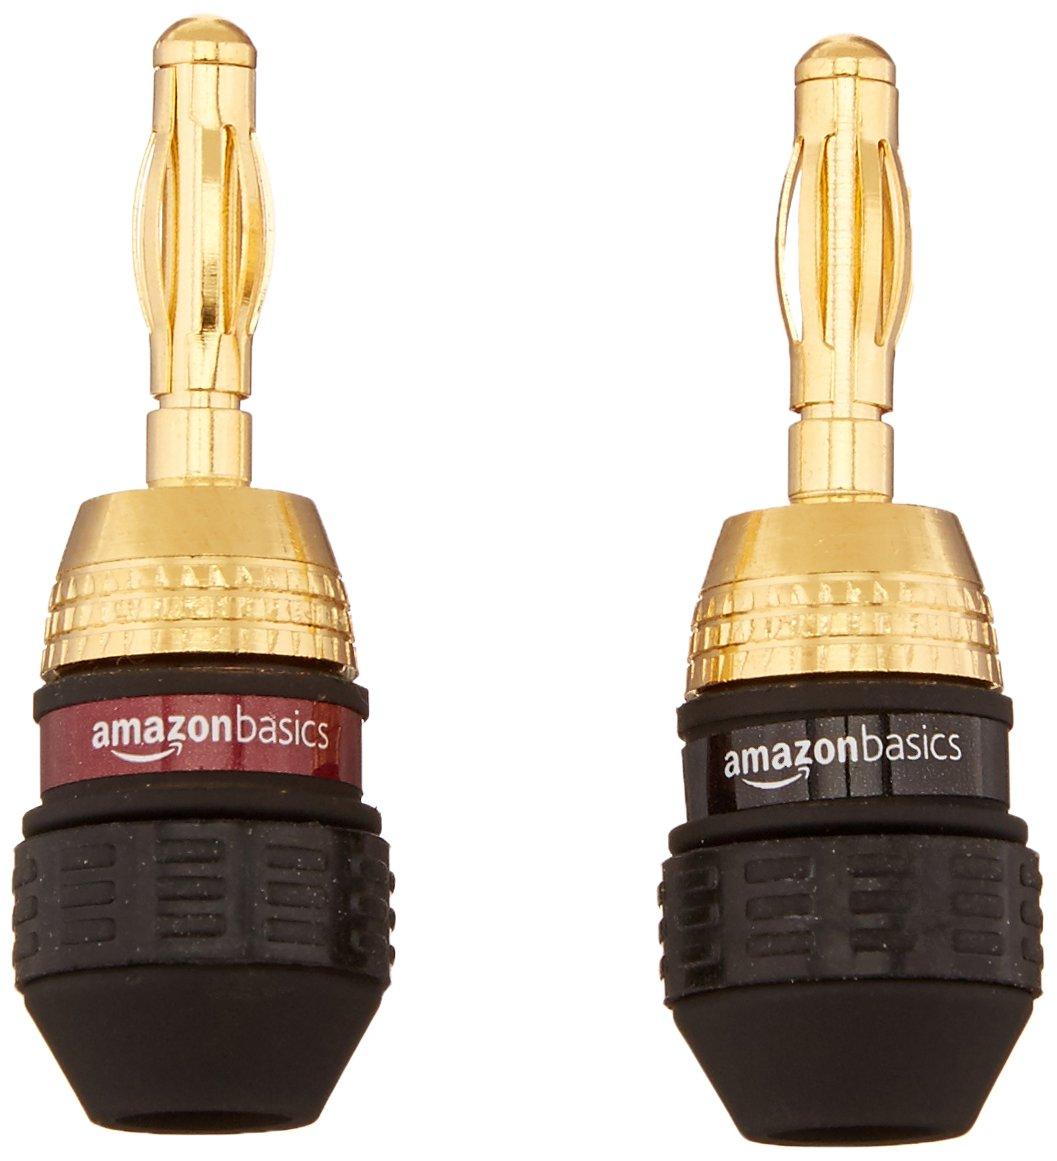 AmazonBasics Banana Plugs - 12 pairs